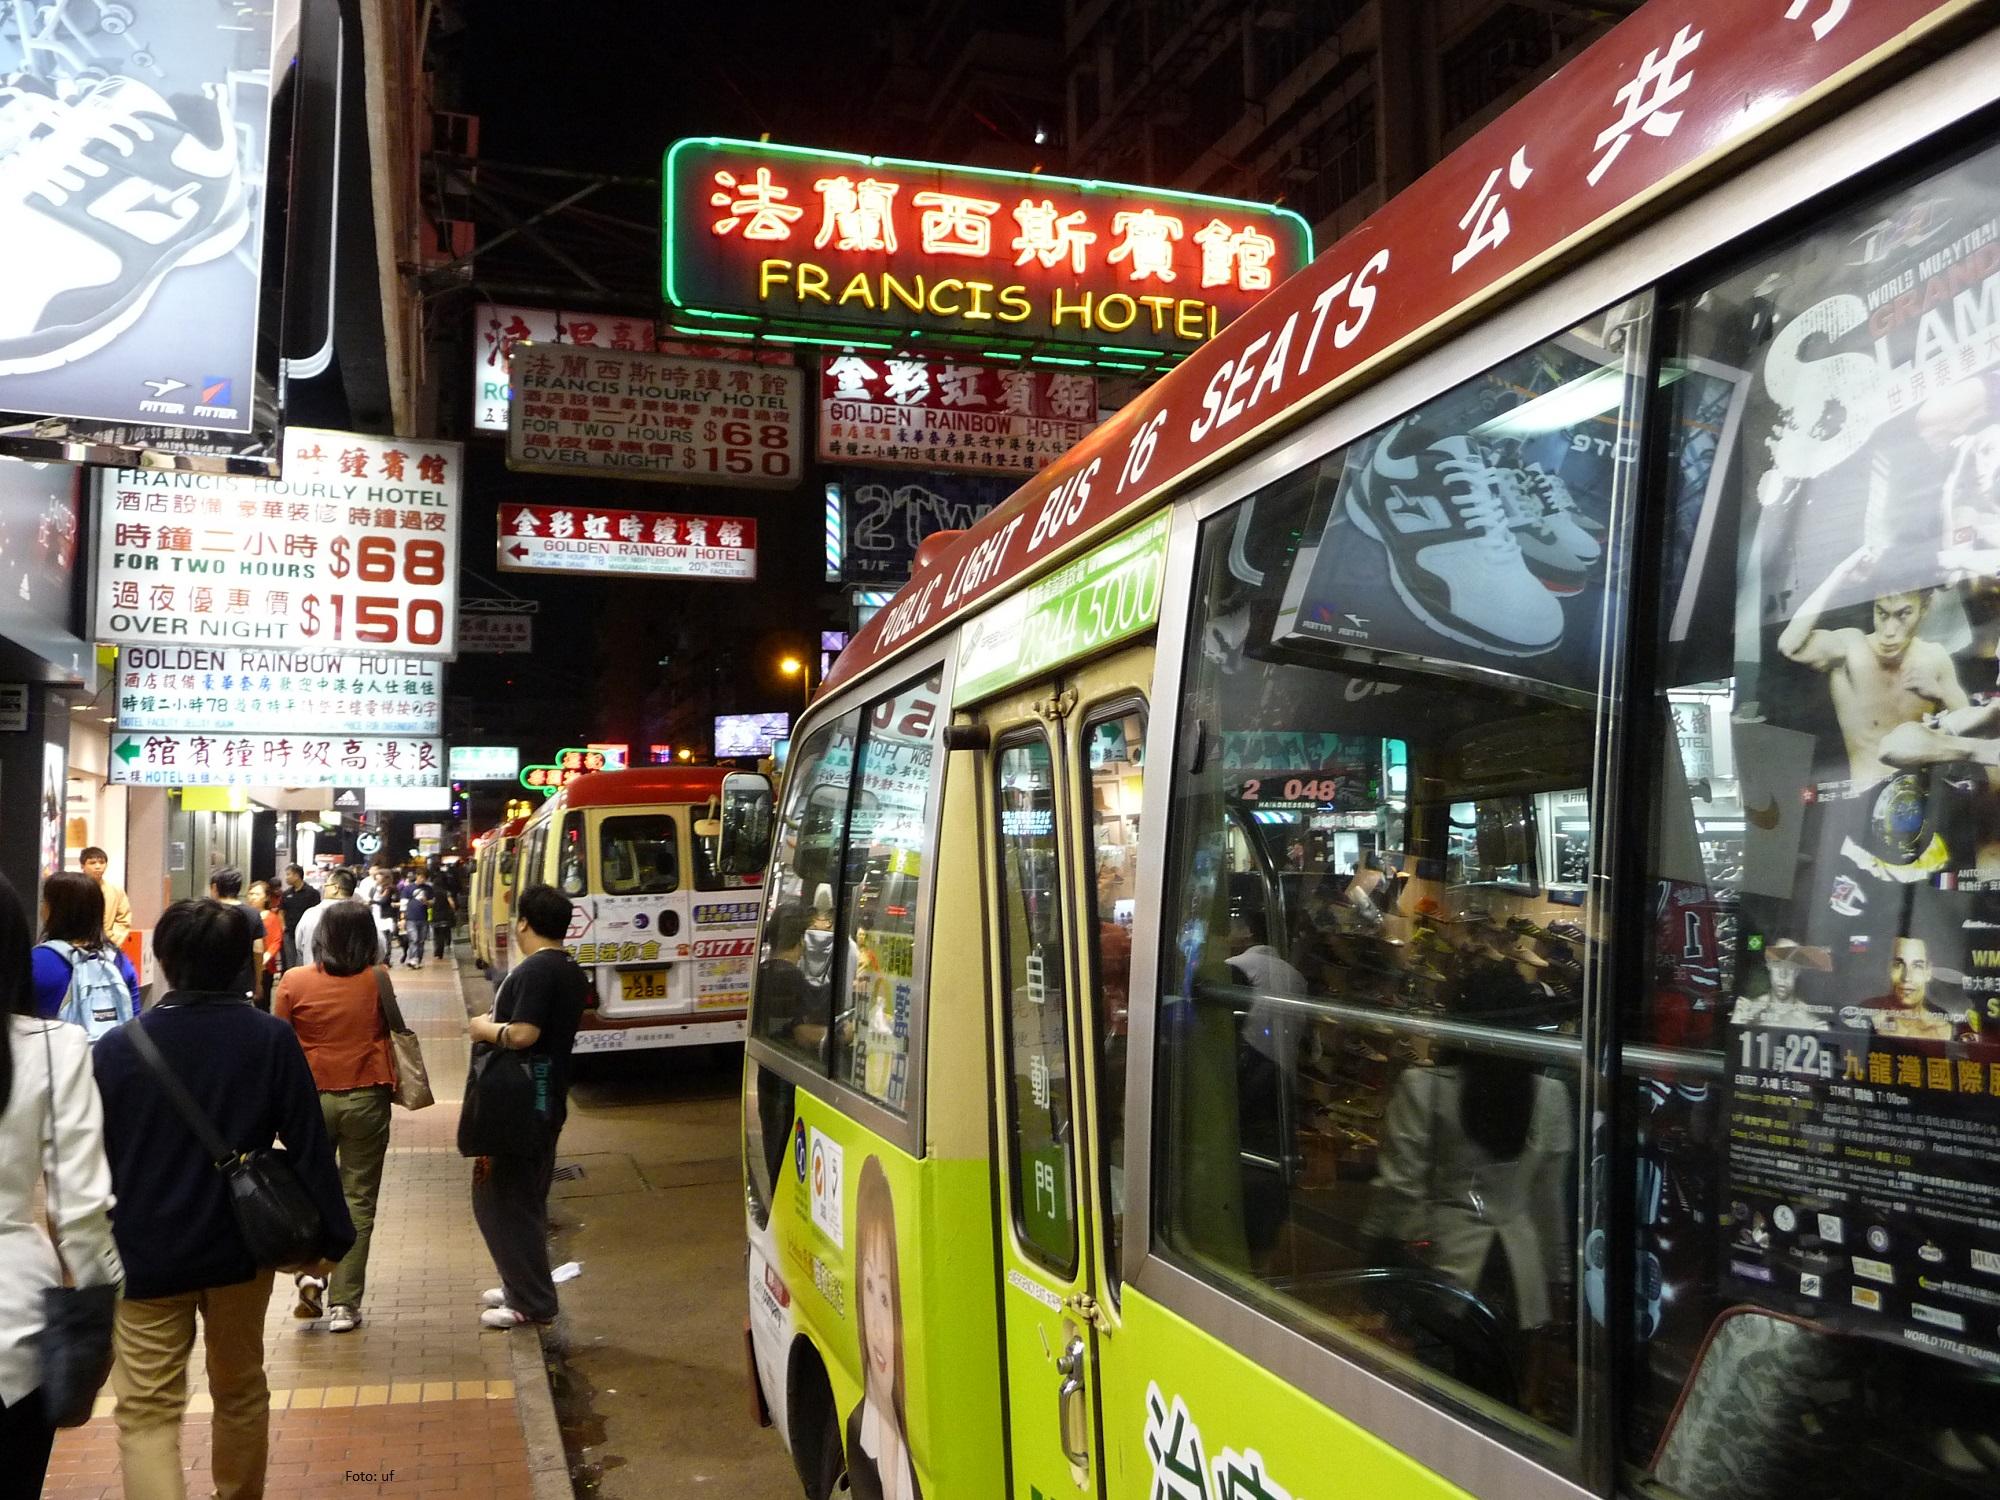 beliebte Kleinbusse in Hongkong